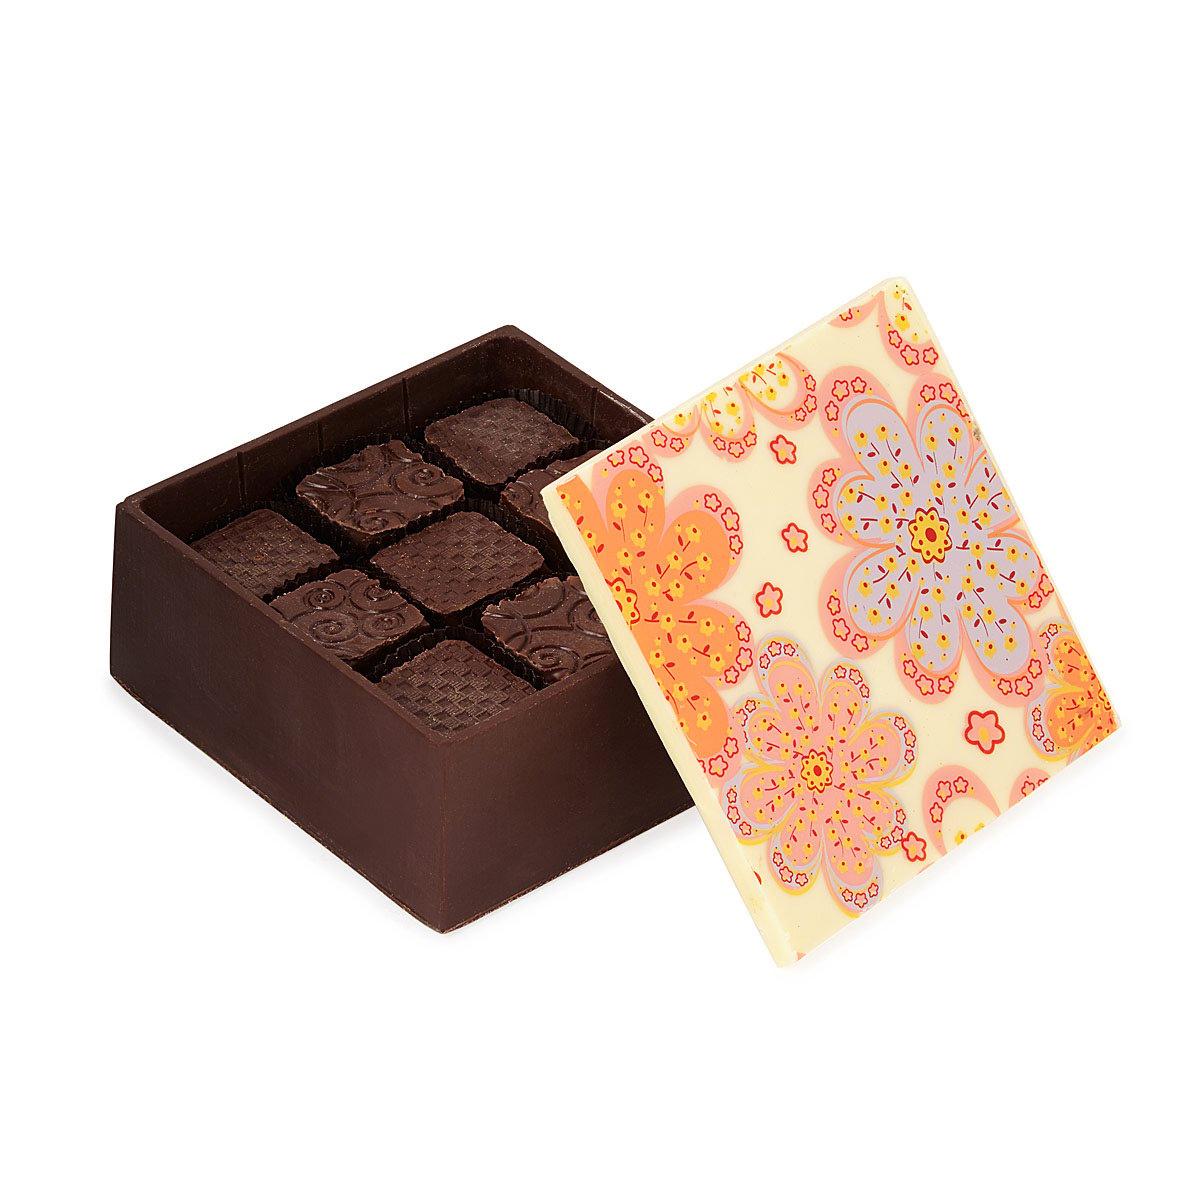 Edible Chocolate Box Of Chocolates